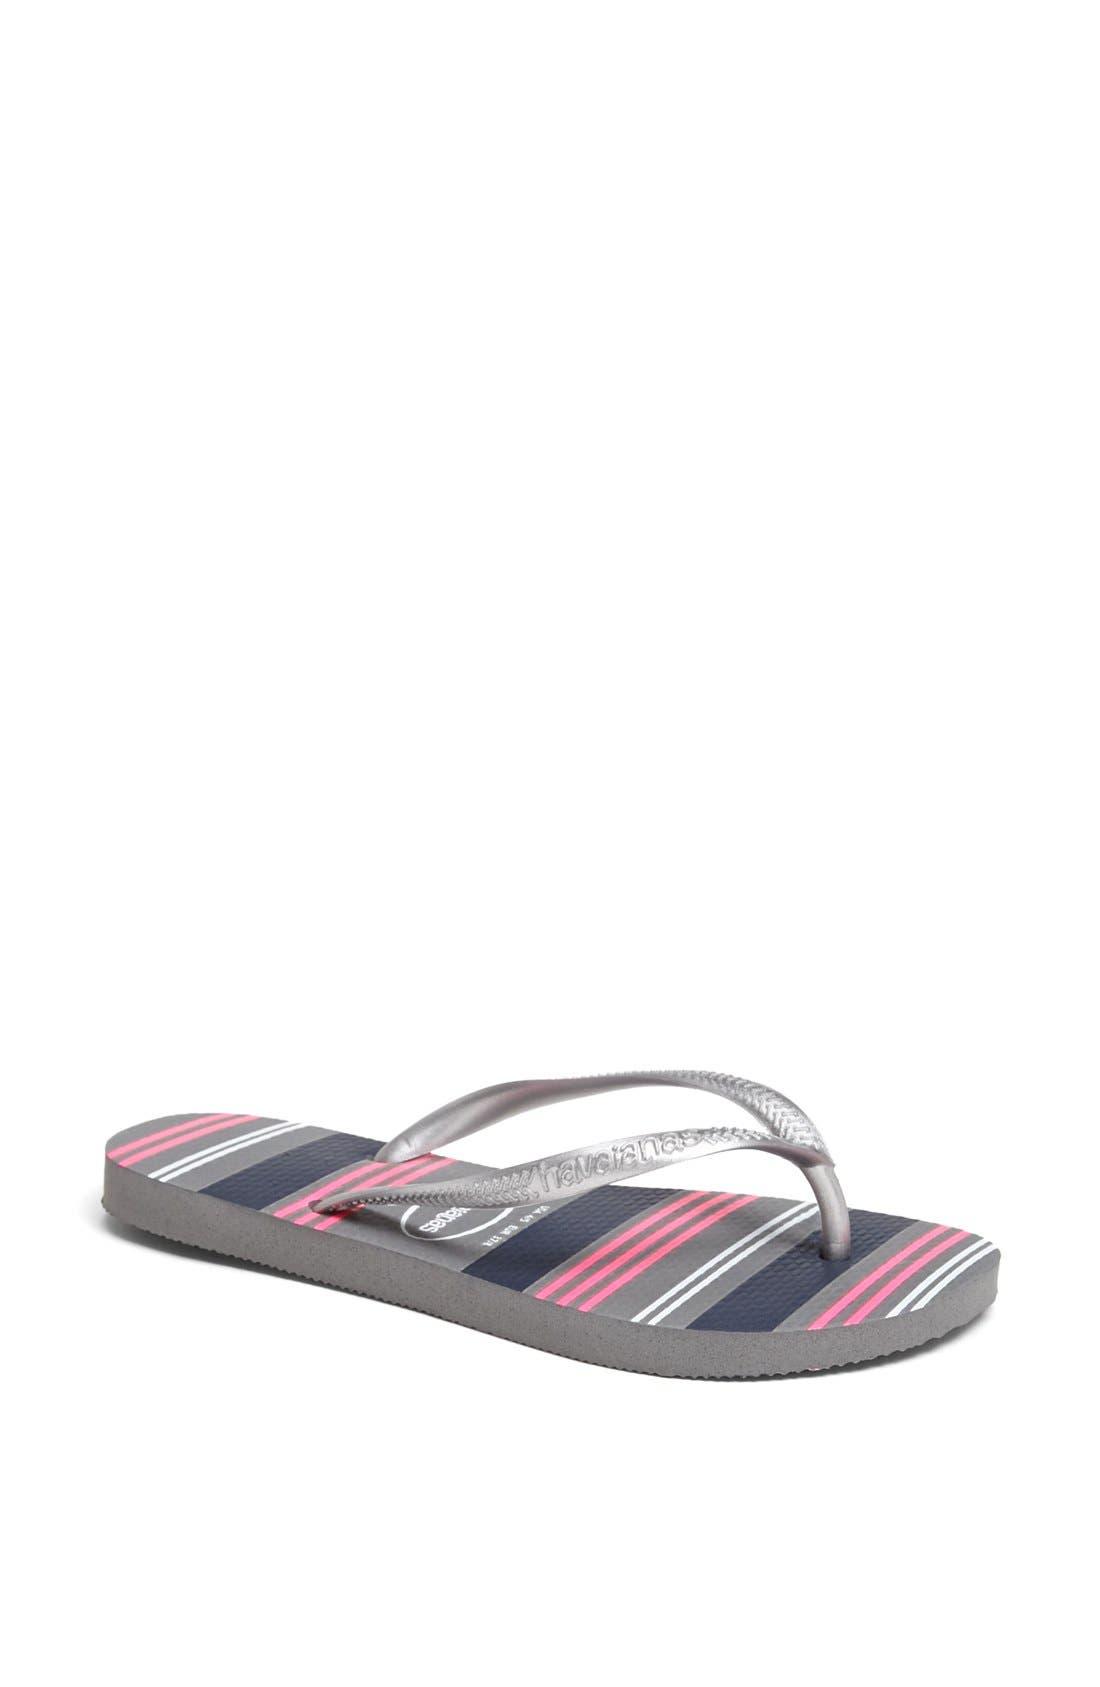 Main Image - Havaianas 'Slim - Neon Stripes' Sandal